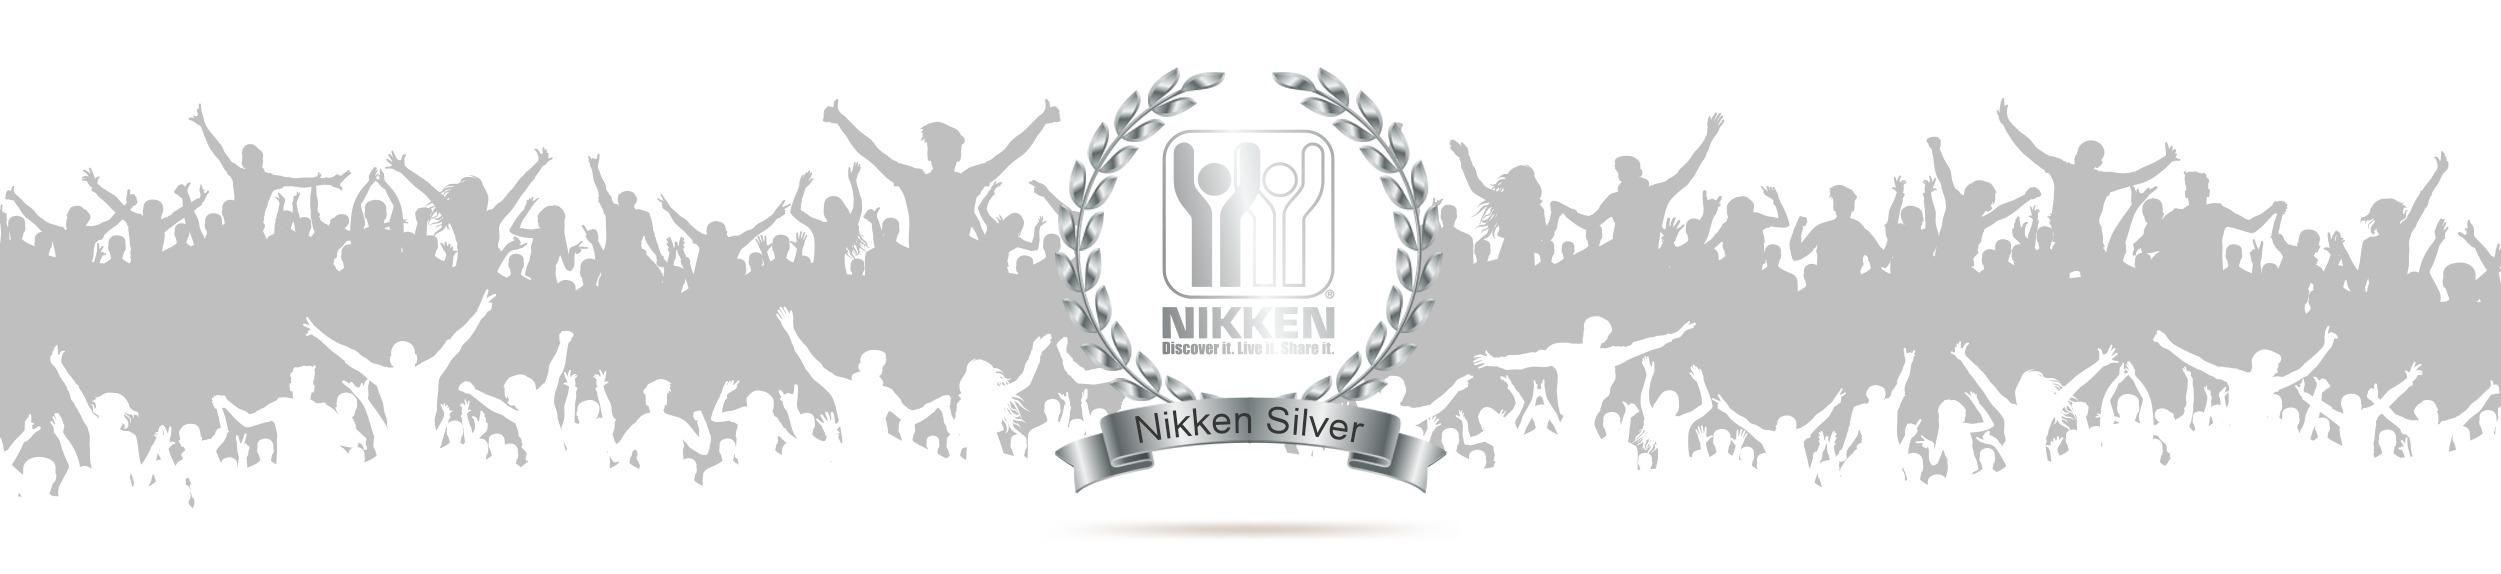 Nikken Silver Banner